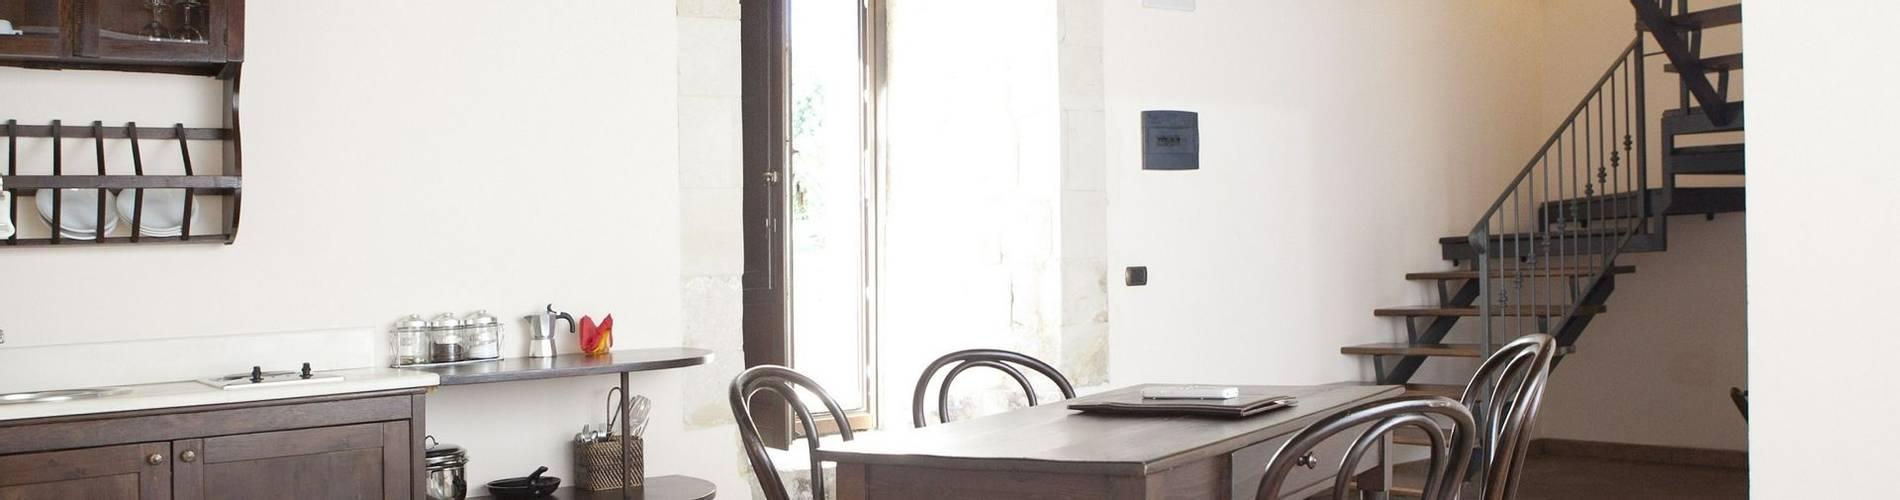 Torre Marabino, Sicily, Italy, Suite Moscato della Torre (2).jpg